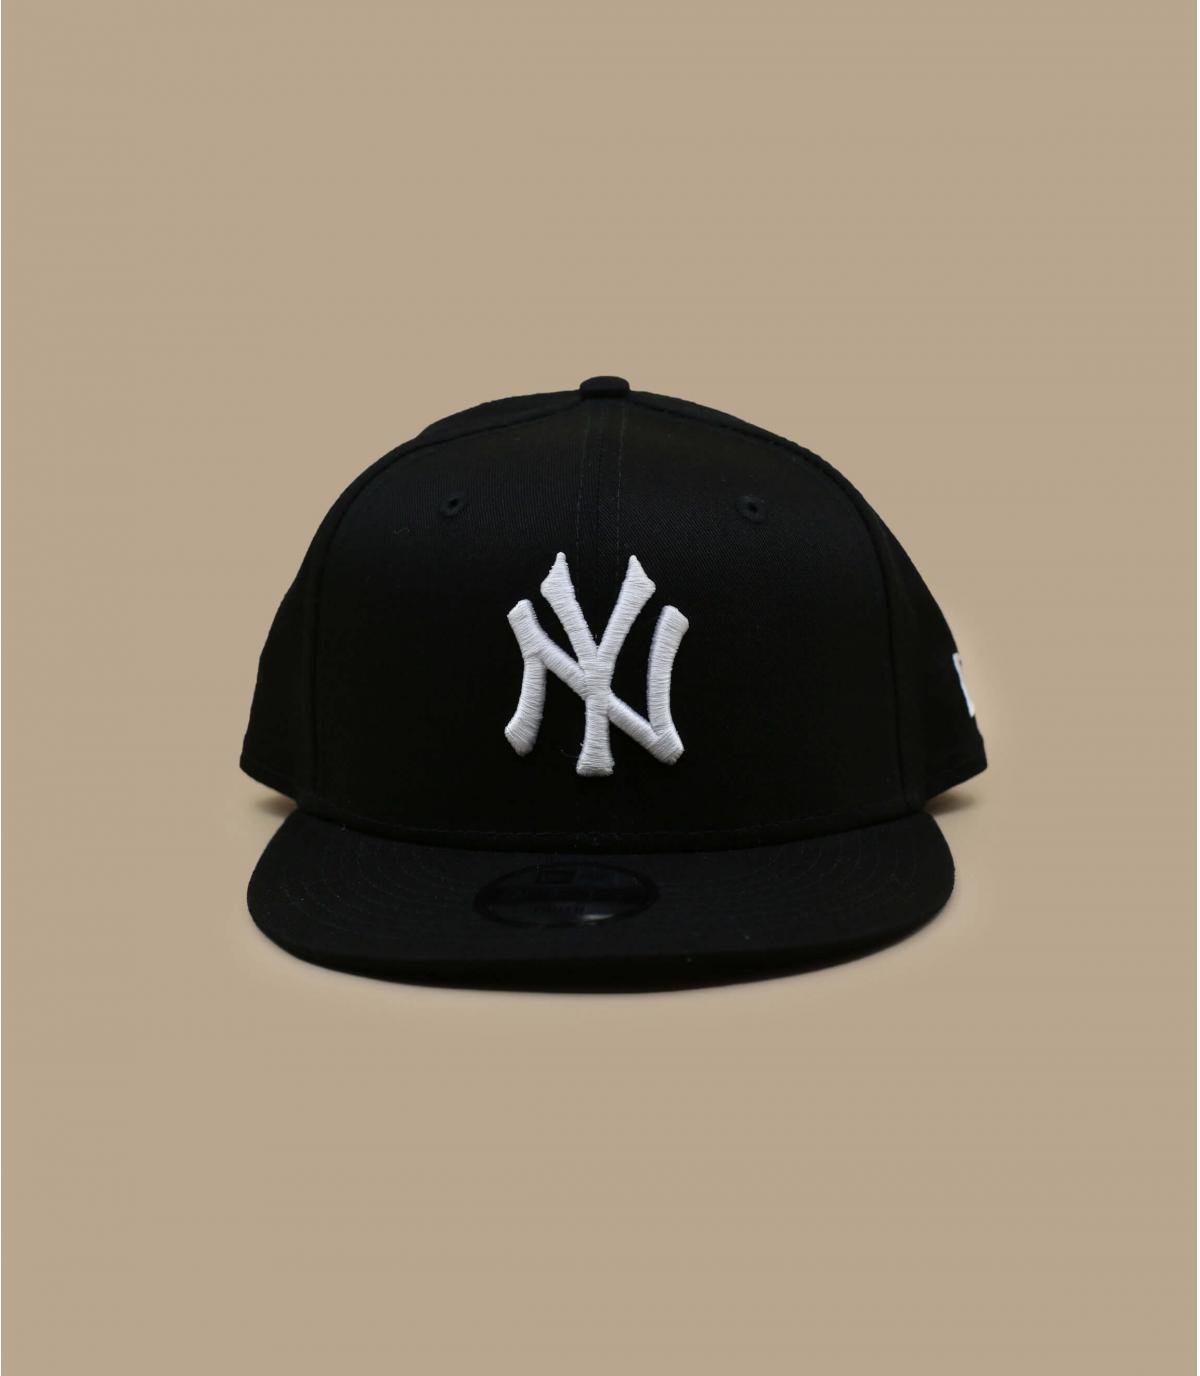 black and white NY child cap